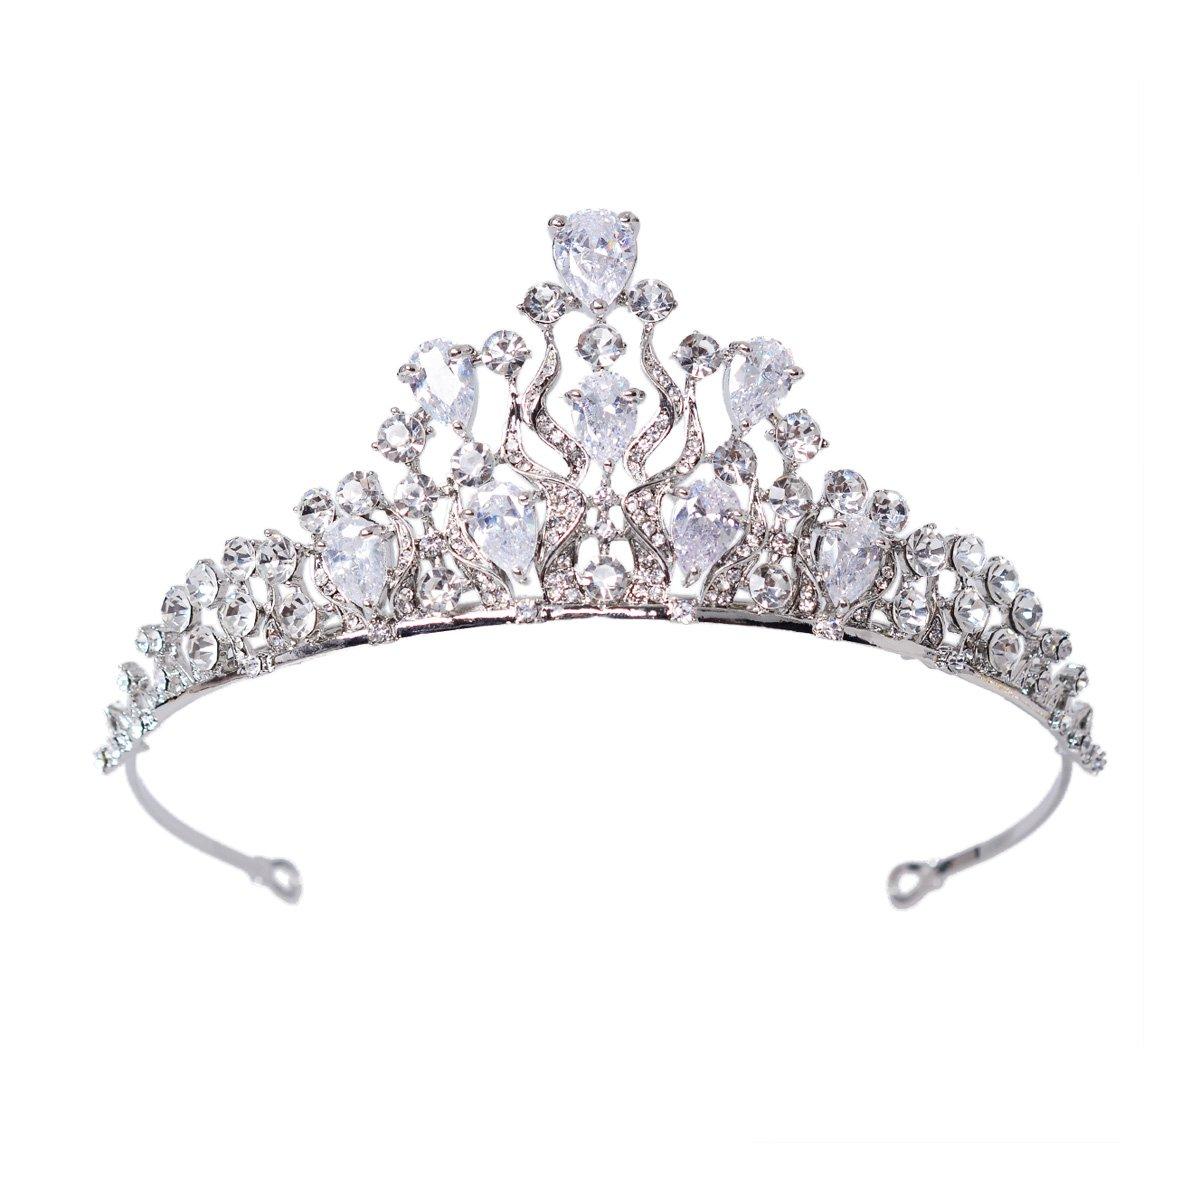 FF Bridal Crown Tiaras for Brides Wedding Hair Accessories (Silver)